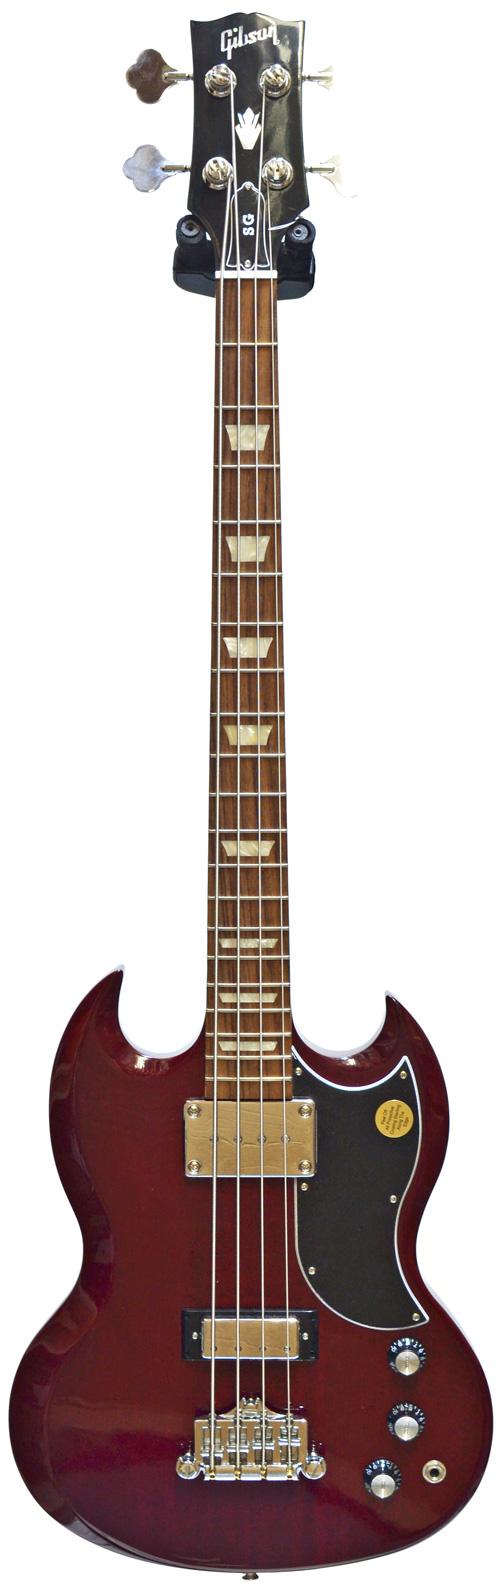 Best Pickups Gibson Sg Standard Free Download Iceman Bass Guitar Wiring Diagram Images